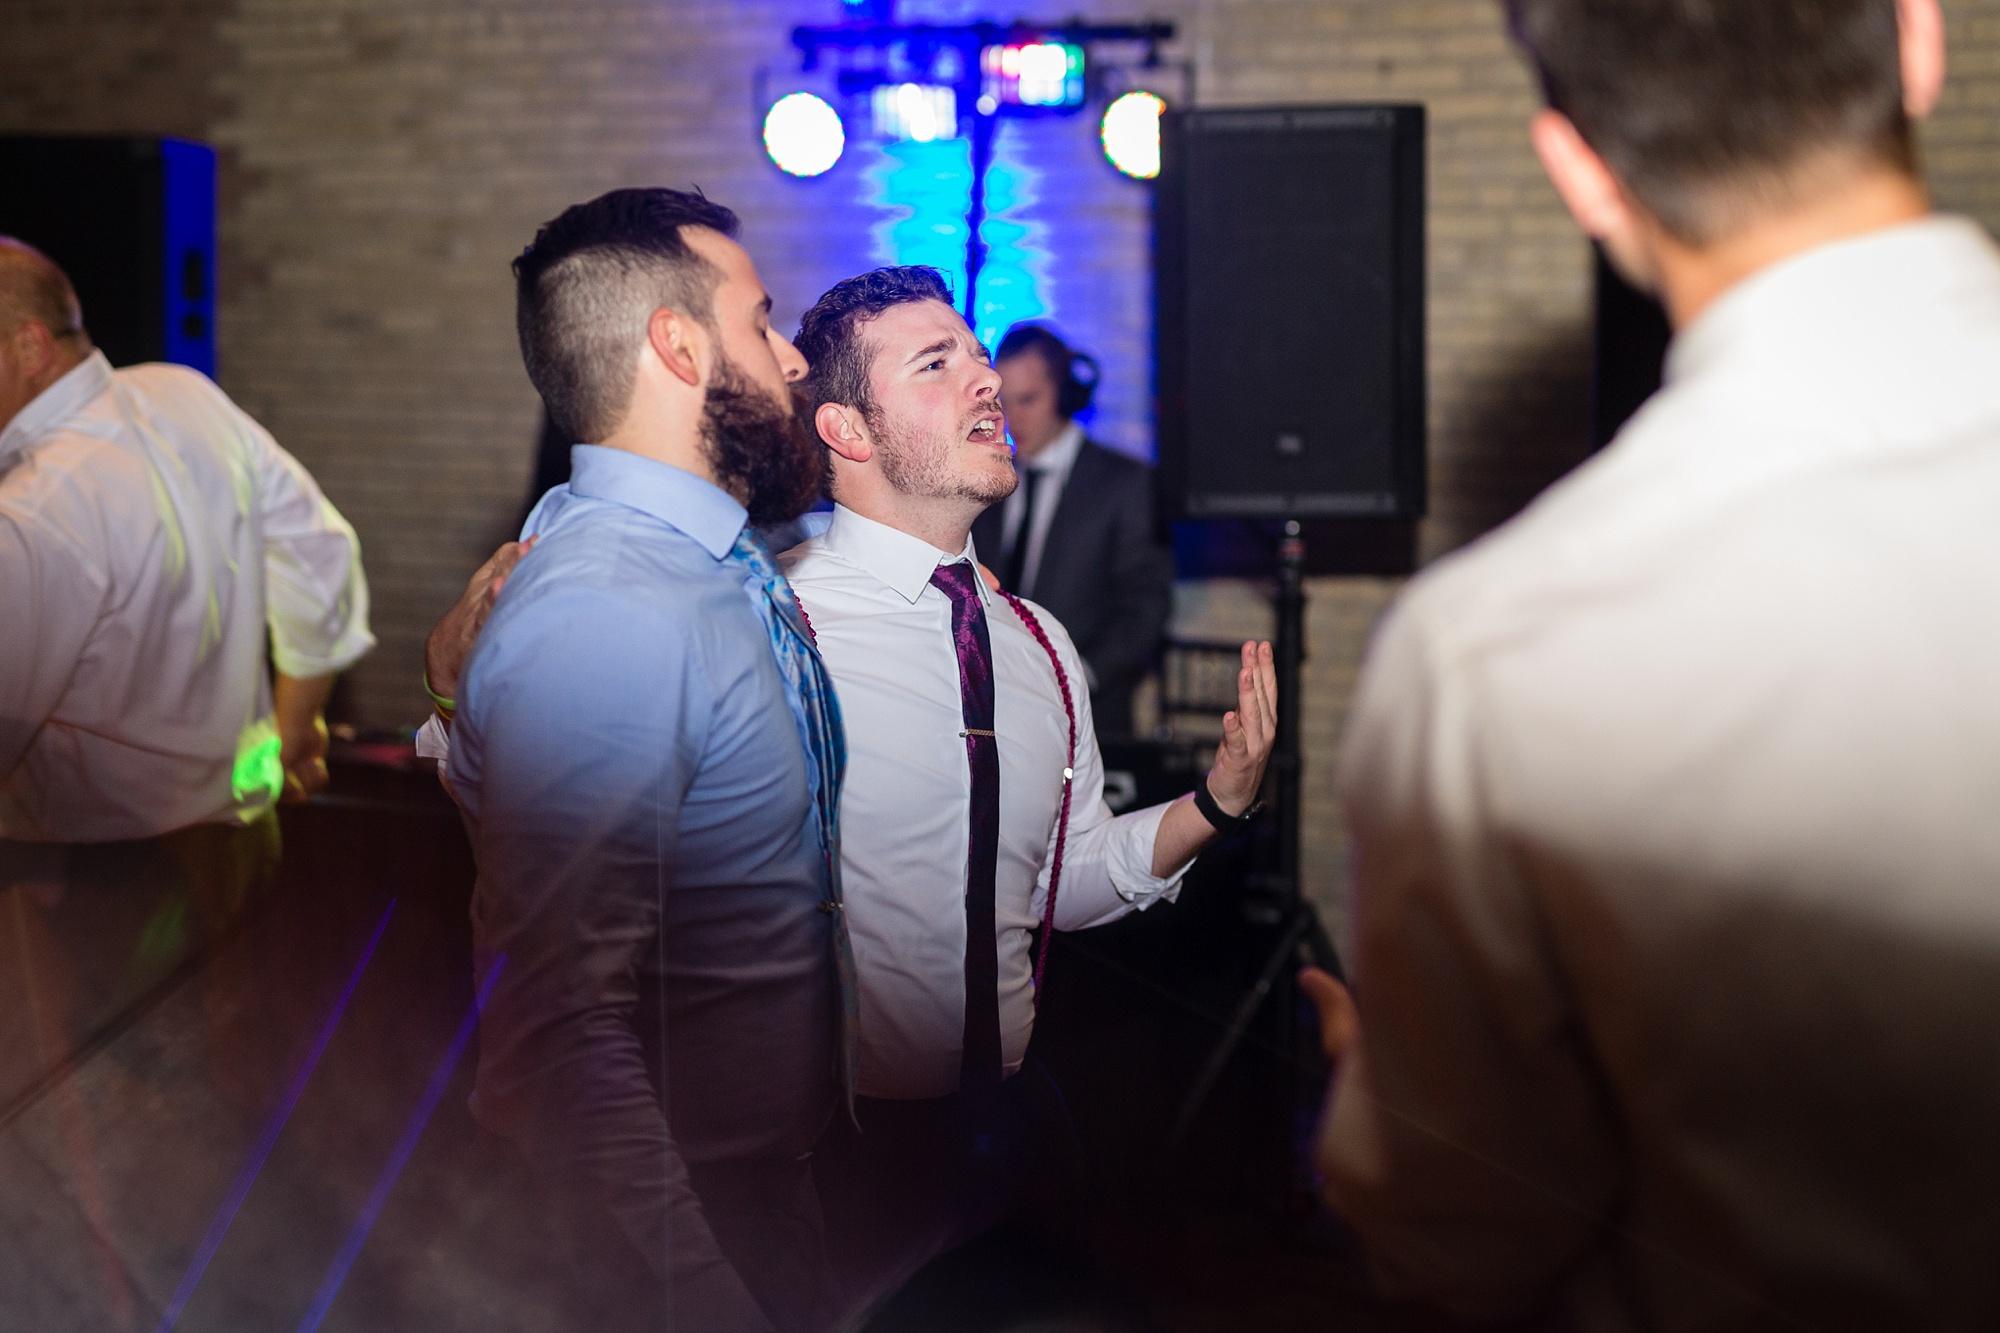 Brandon_Shafer_Photography_Lauren_Ethan_New_Vintage_Place_Grand_Rapids_Wedding_0059.jpg